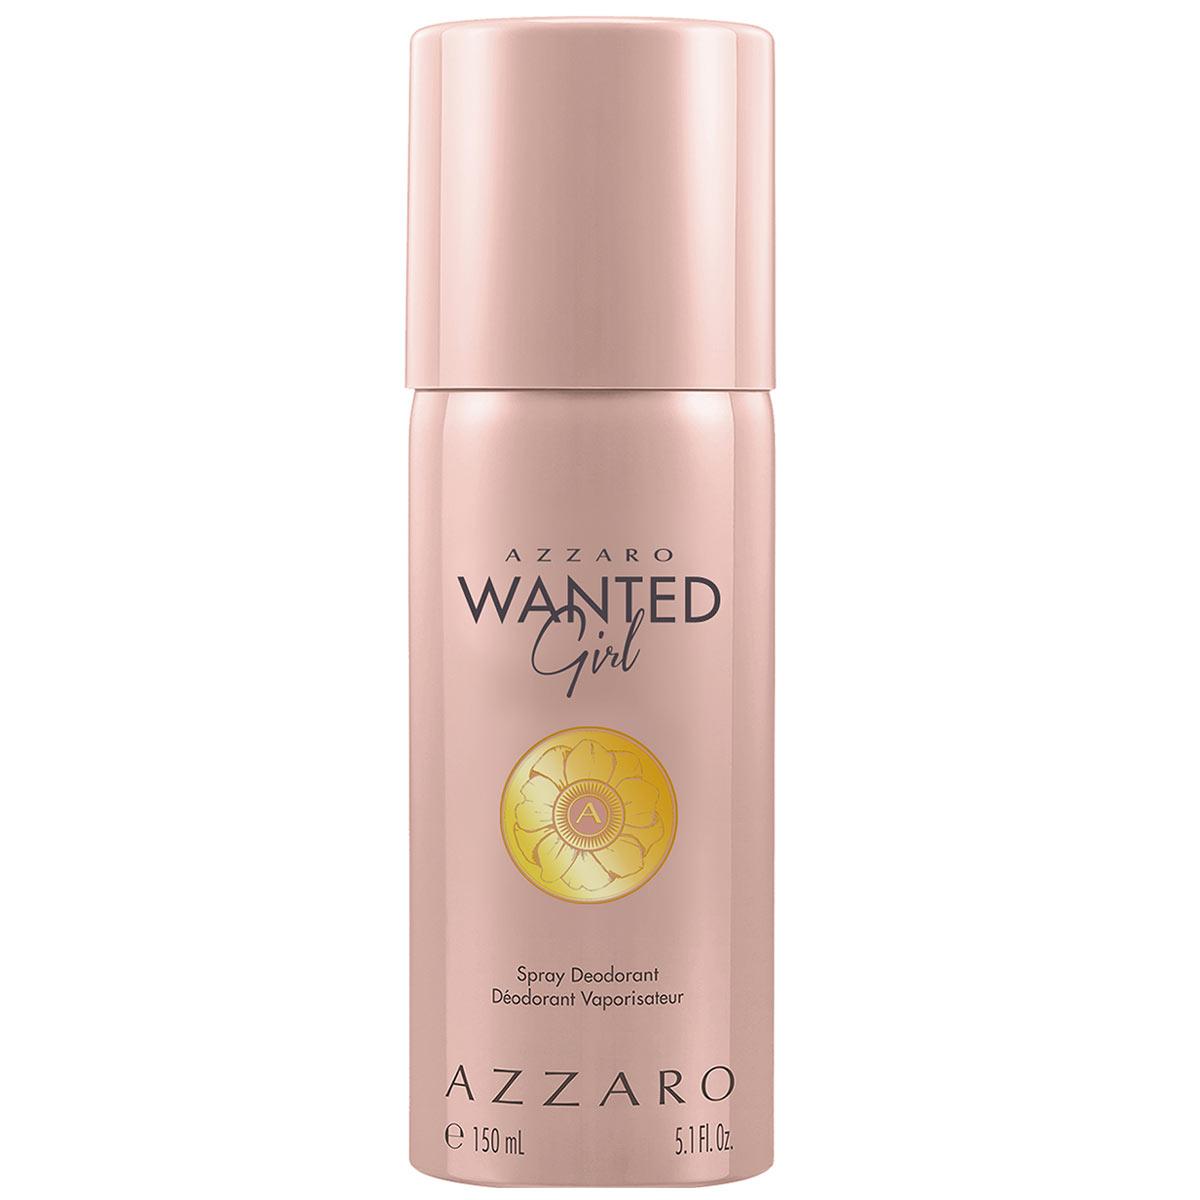 Déodorant spray Wanted Girl - AZZARO